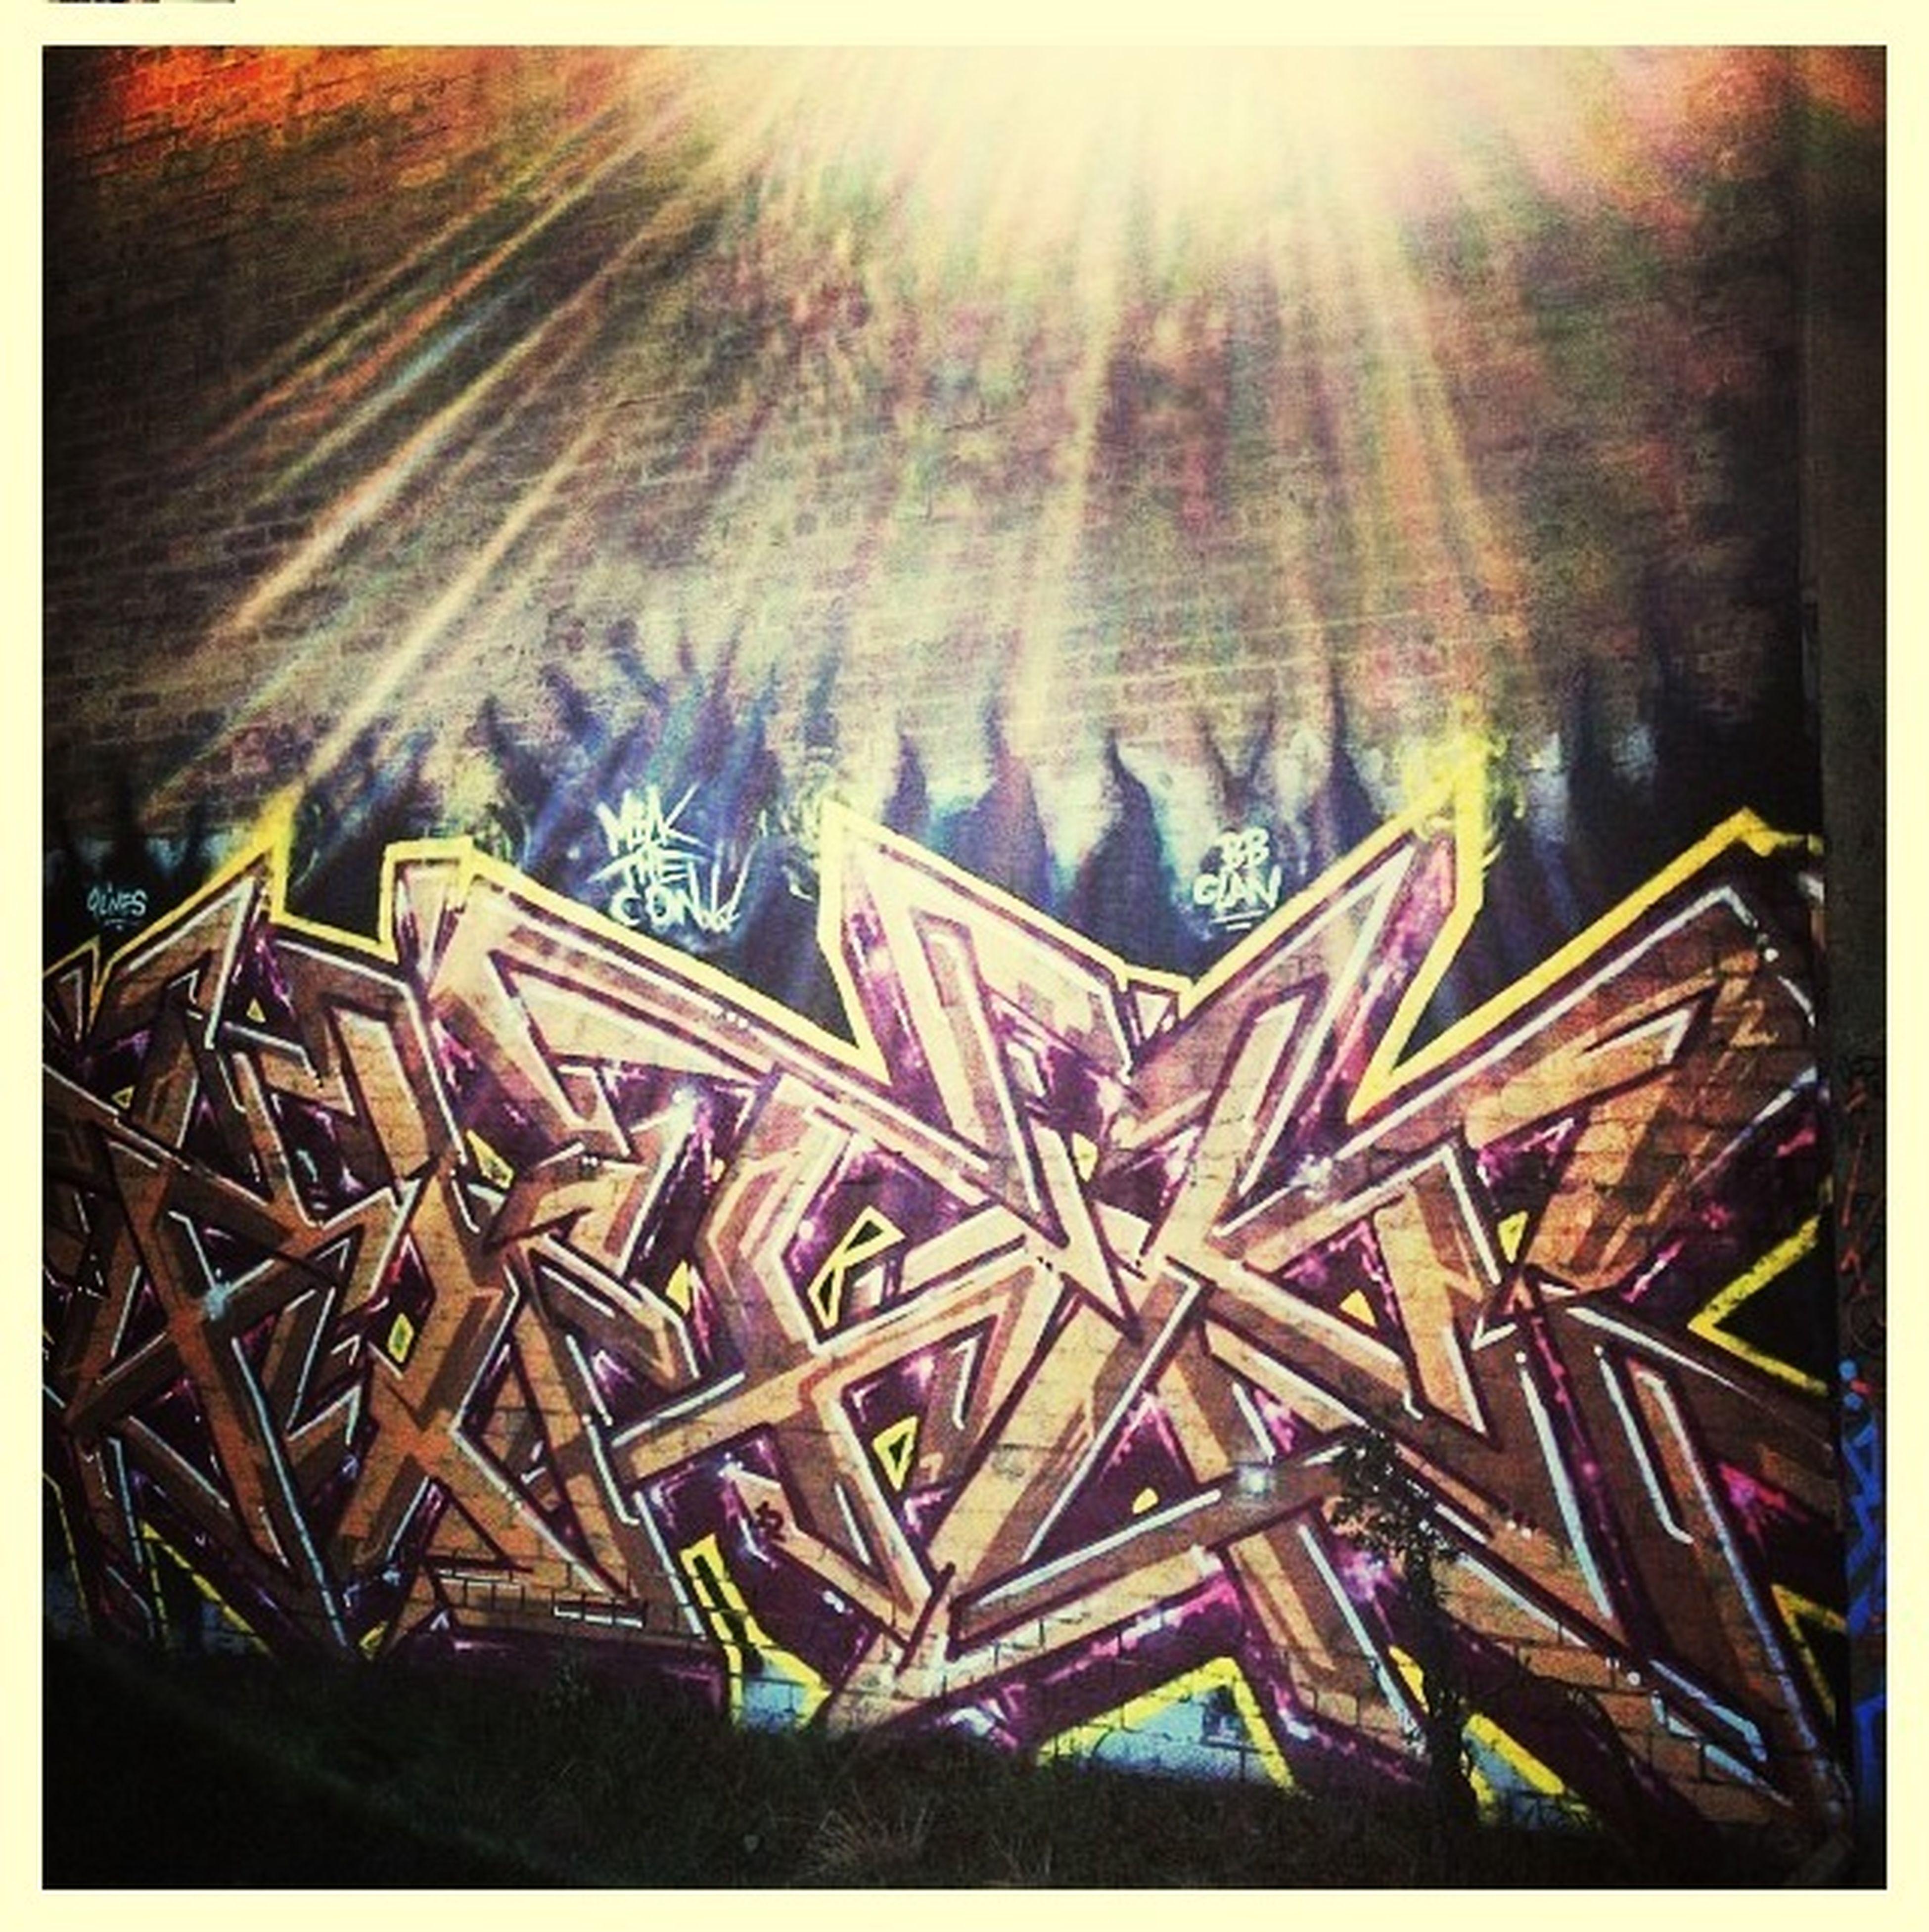 Graffiti Abandoned Places God's Handiwork